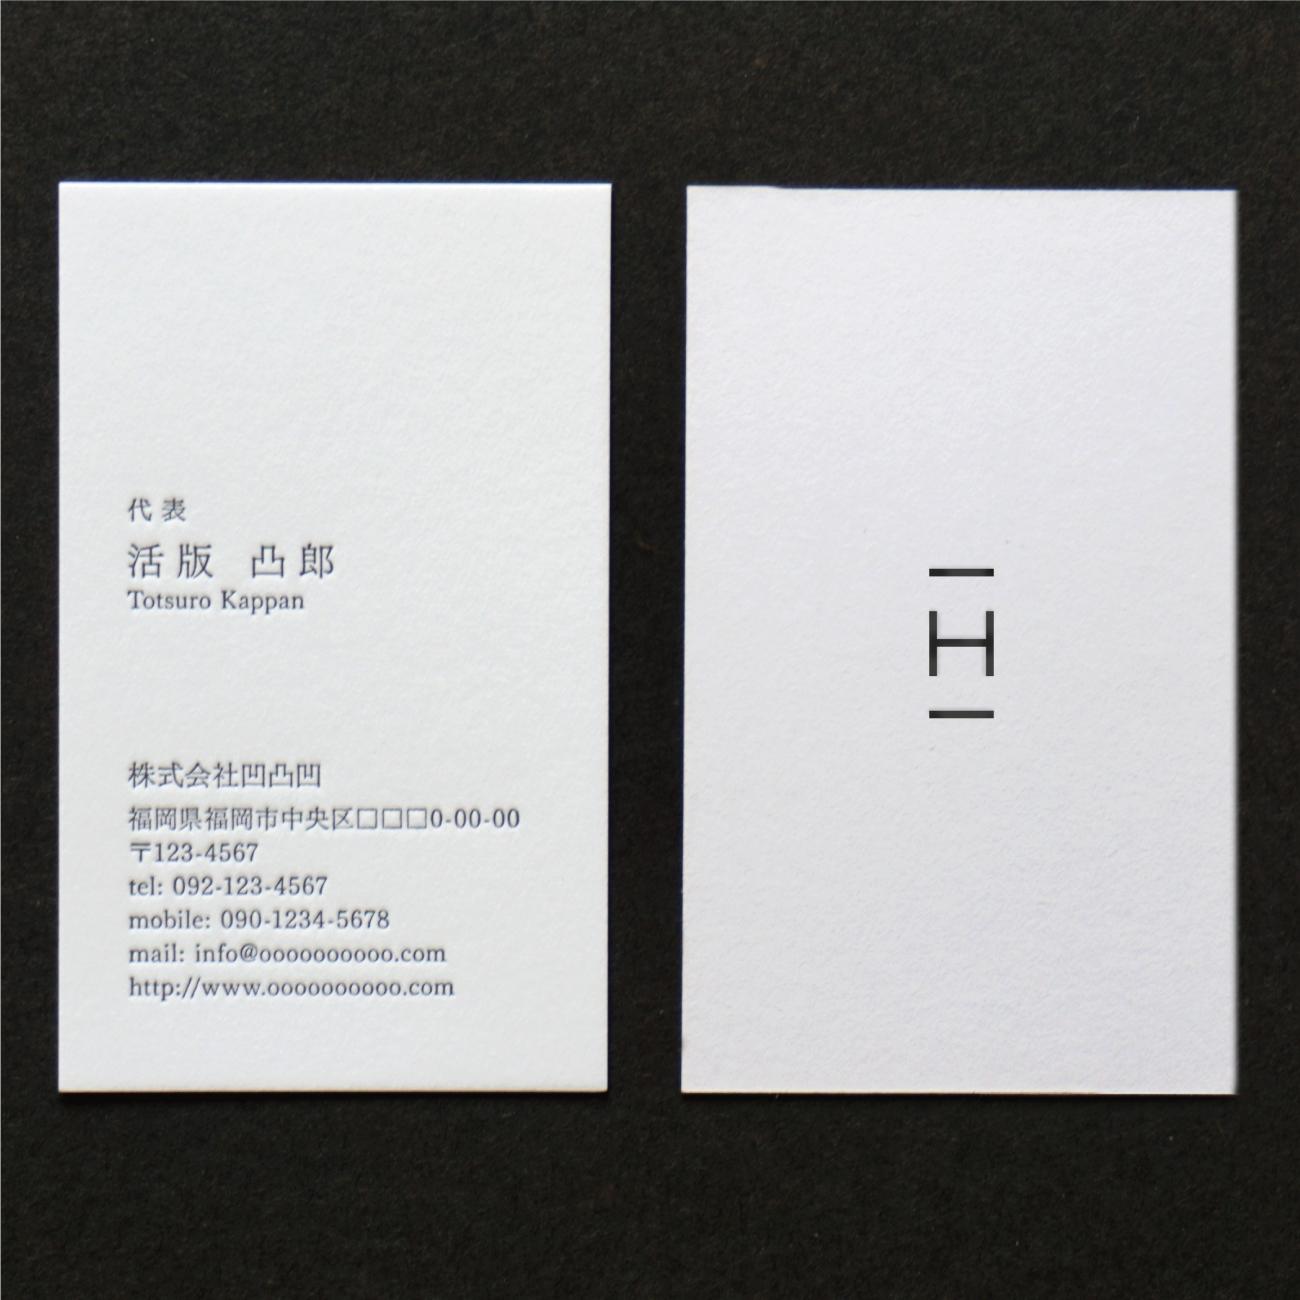 活版両面印刷カード